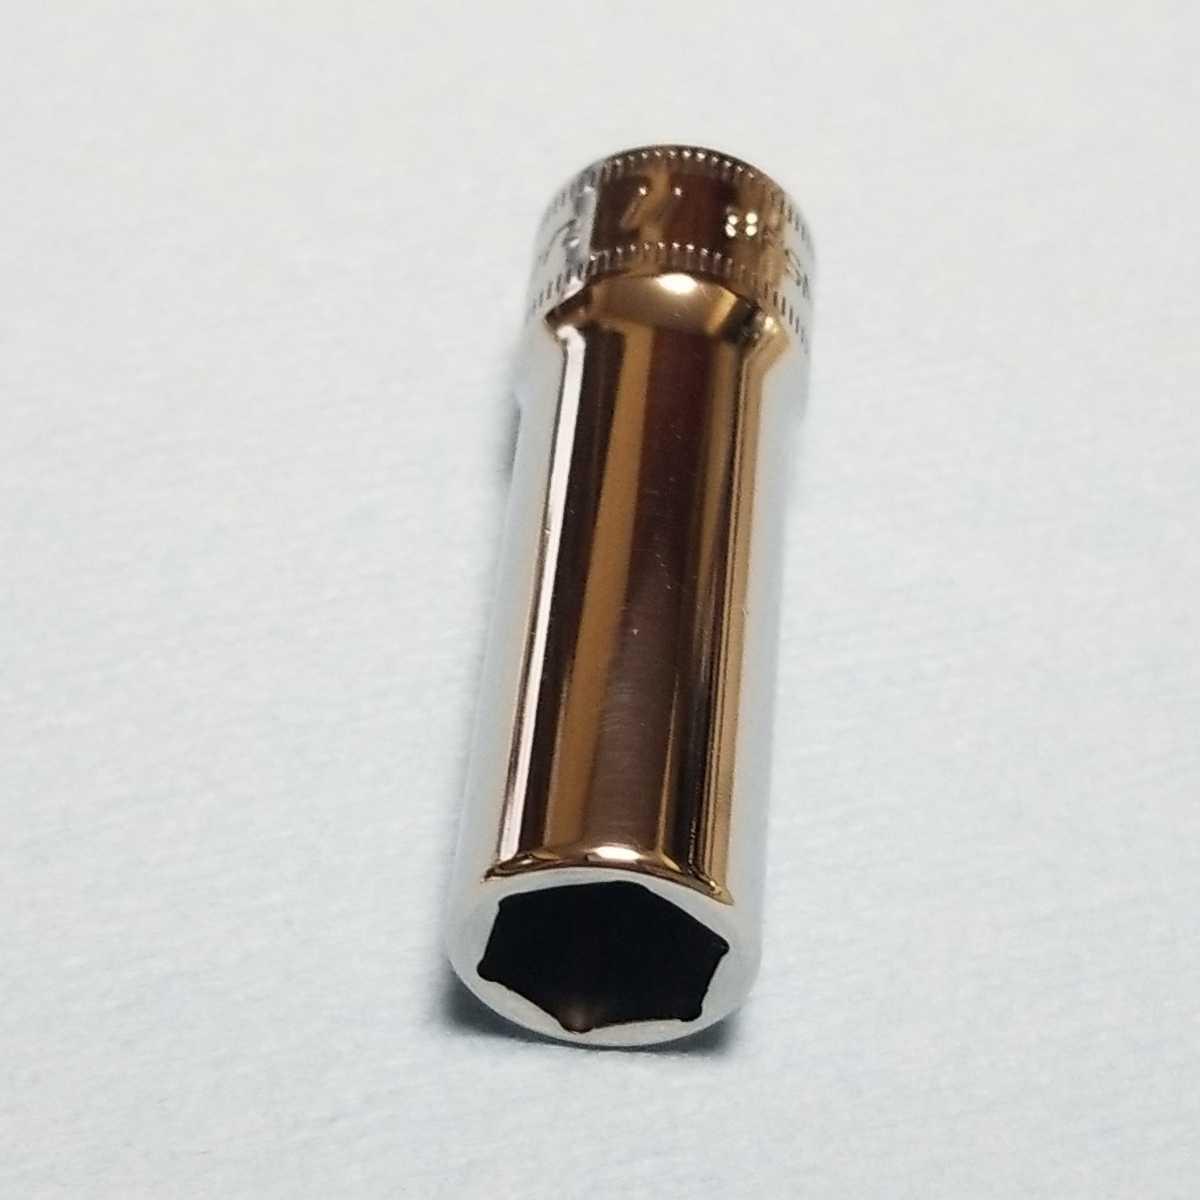 11mm 3/8 ディープ スナップオン SFSM11 (6角) 中古品 超美品 保管品 SNAPON SNAP-ON ディープソケット ソケット 送料無料 Snap-on _画像1